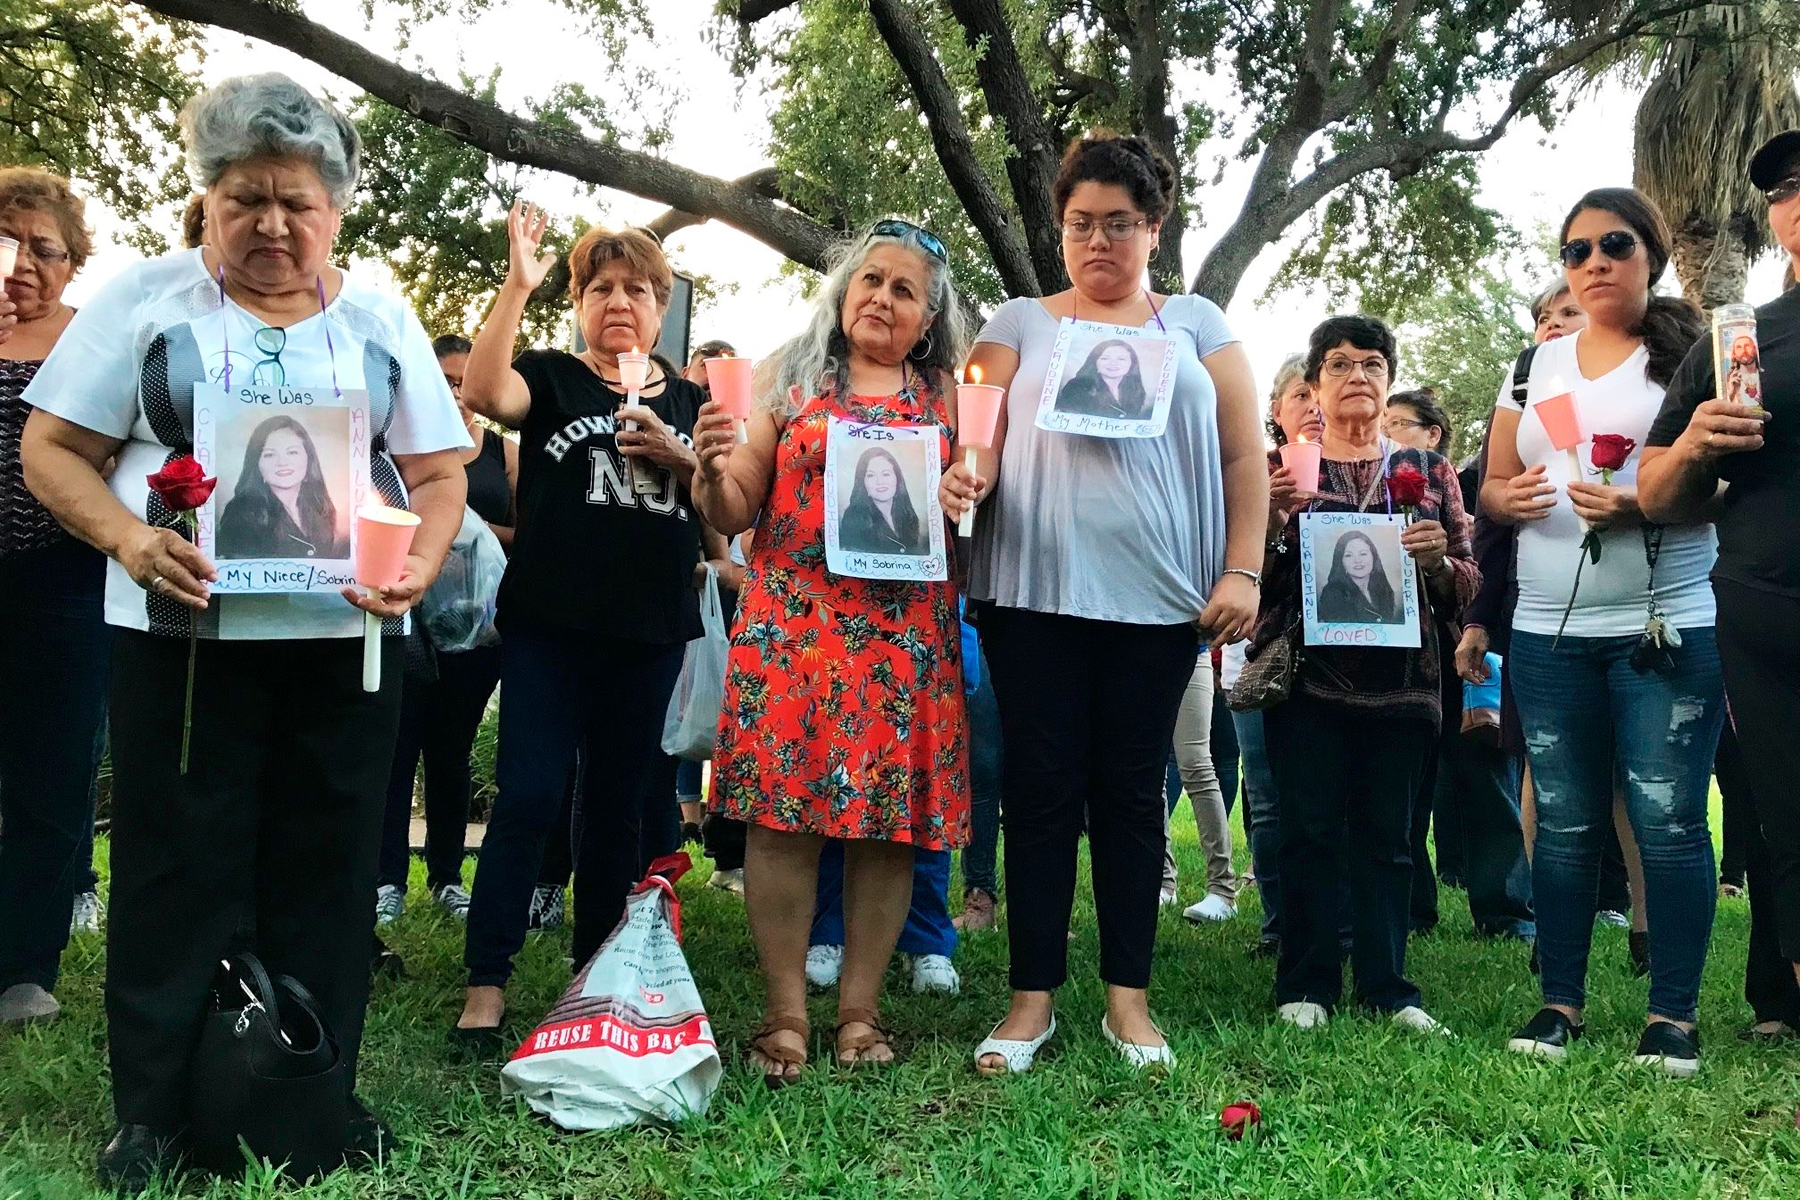 Alleged Border-Patrol Serial Killer: Texas Seeking Death Penalty